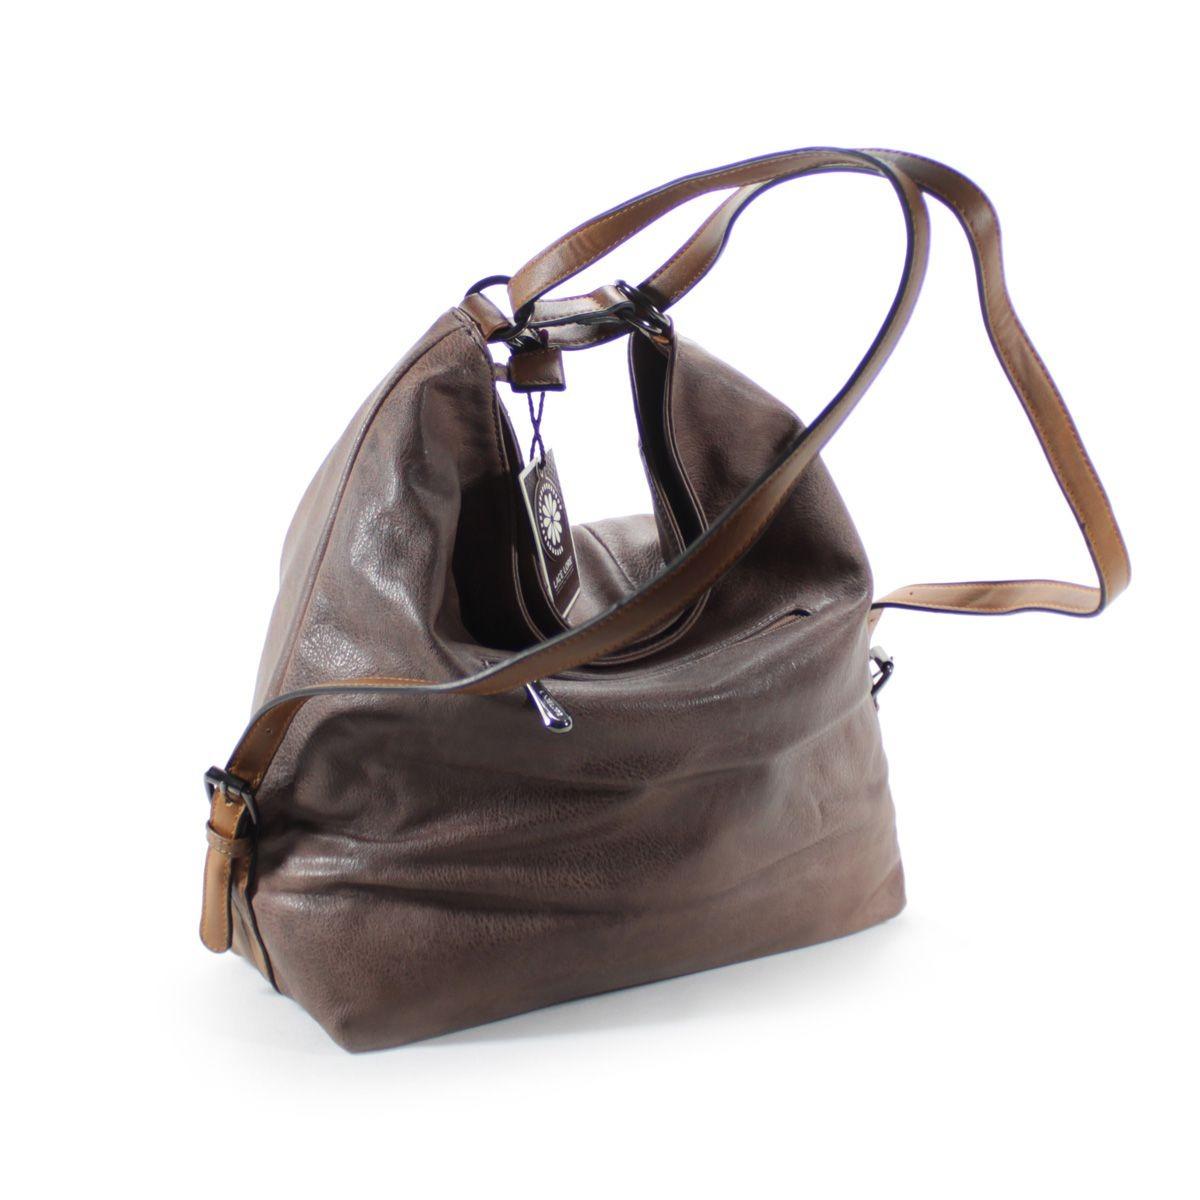 ea3f6a4d21 bolsa feminina grande couro ecologico bolsa e mochila - nova. Carregando  zoom.